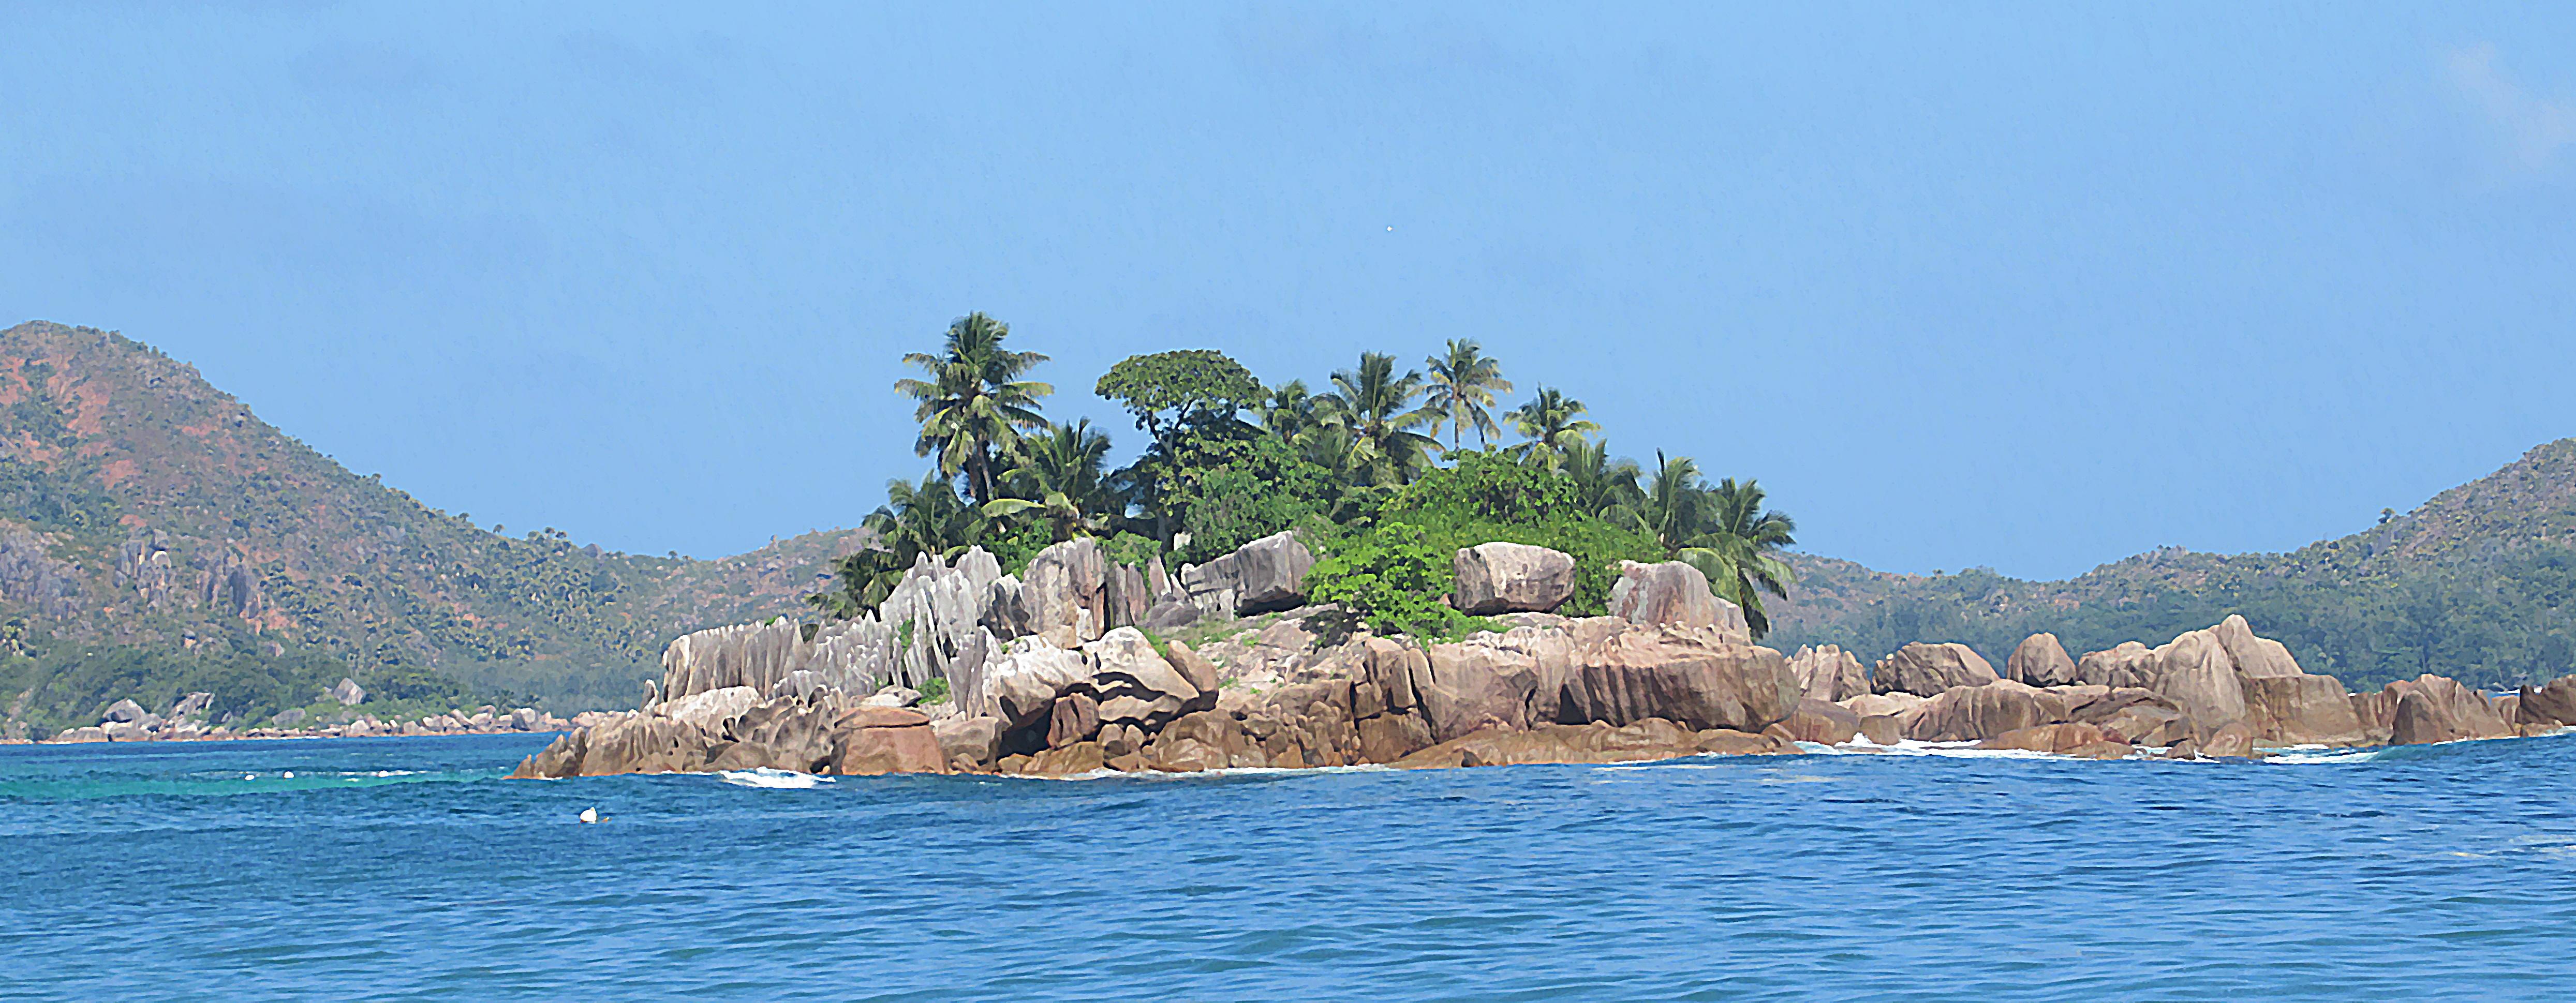 Sailing and Snorkeling Seychelles